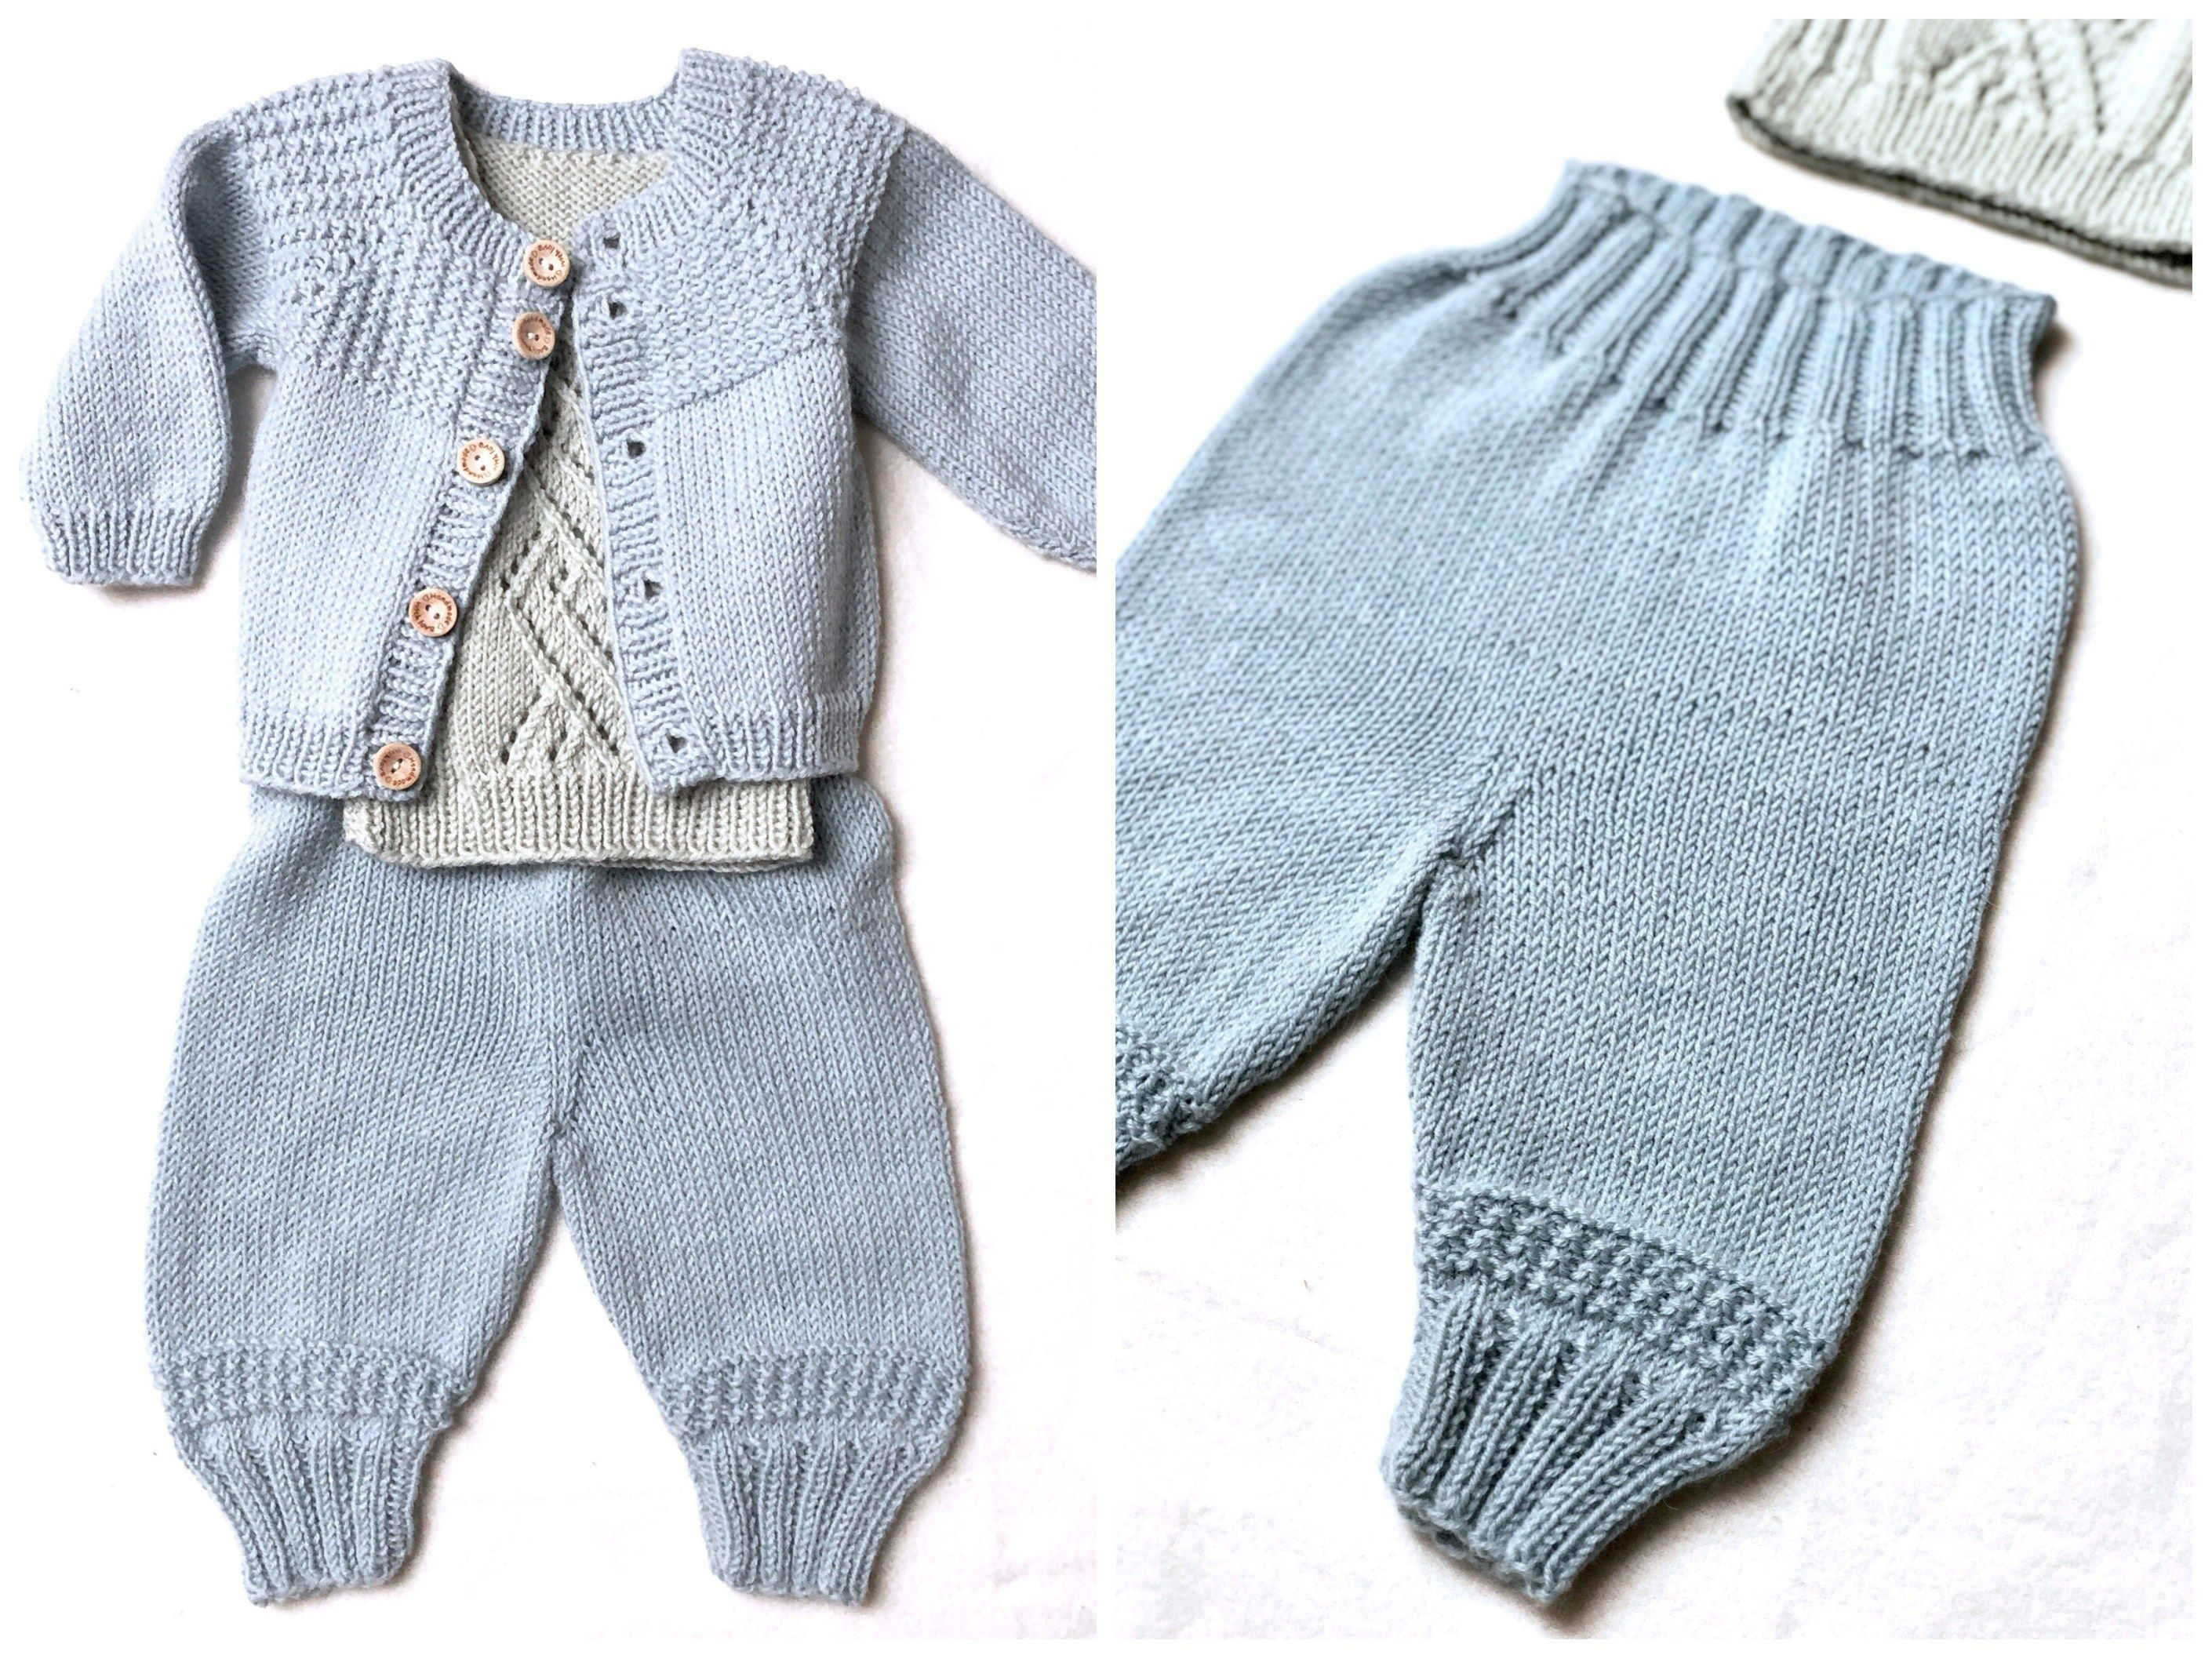 893f92ed66f Johns hentesæt - strikkede babybukser i blød merinould - FiftyFabulous